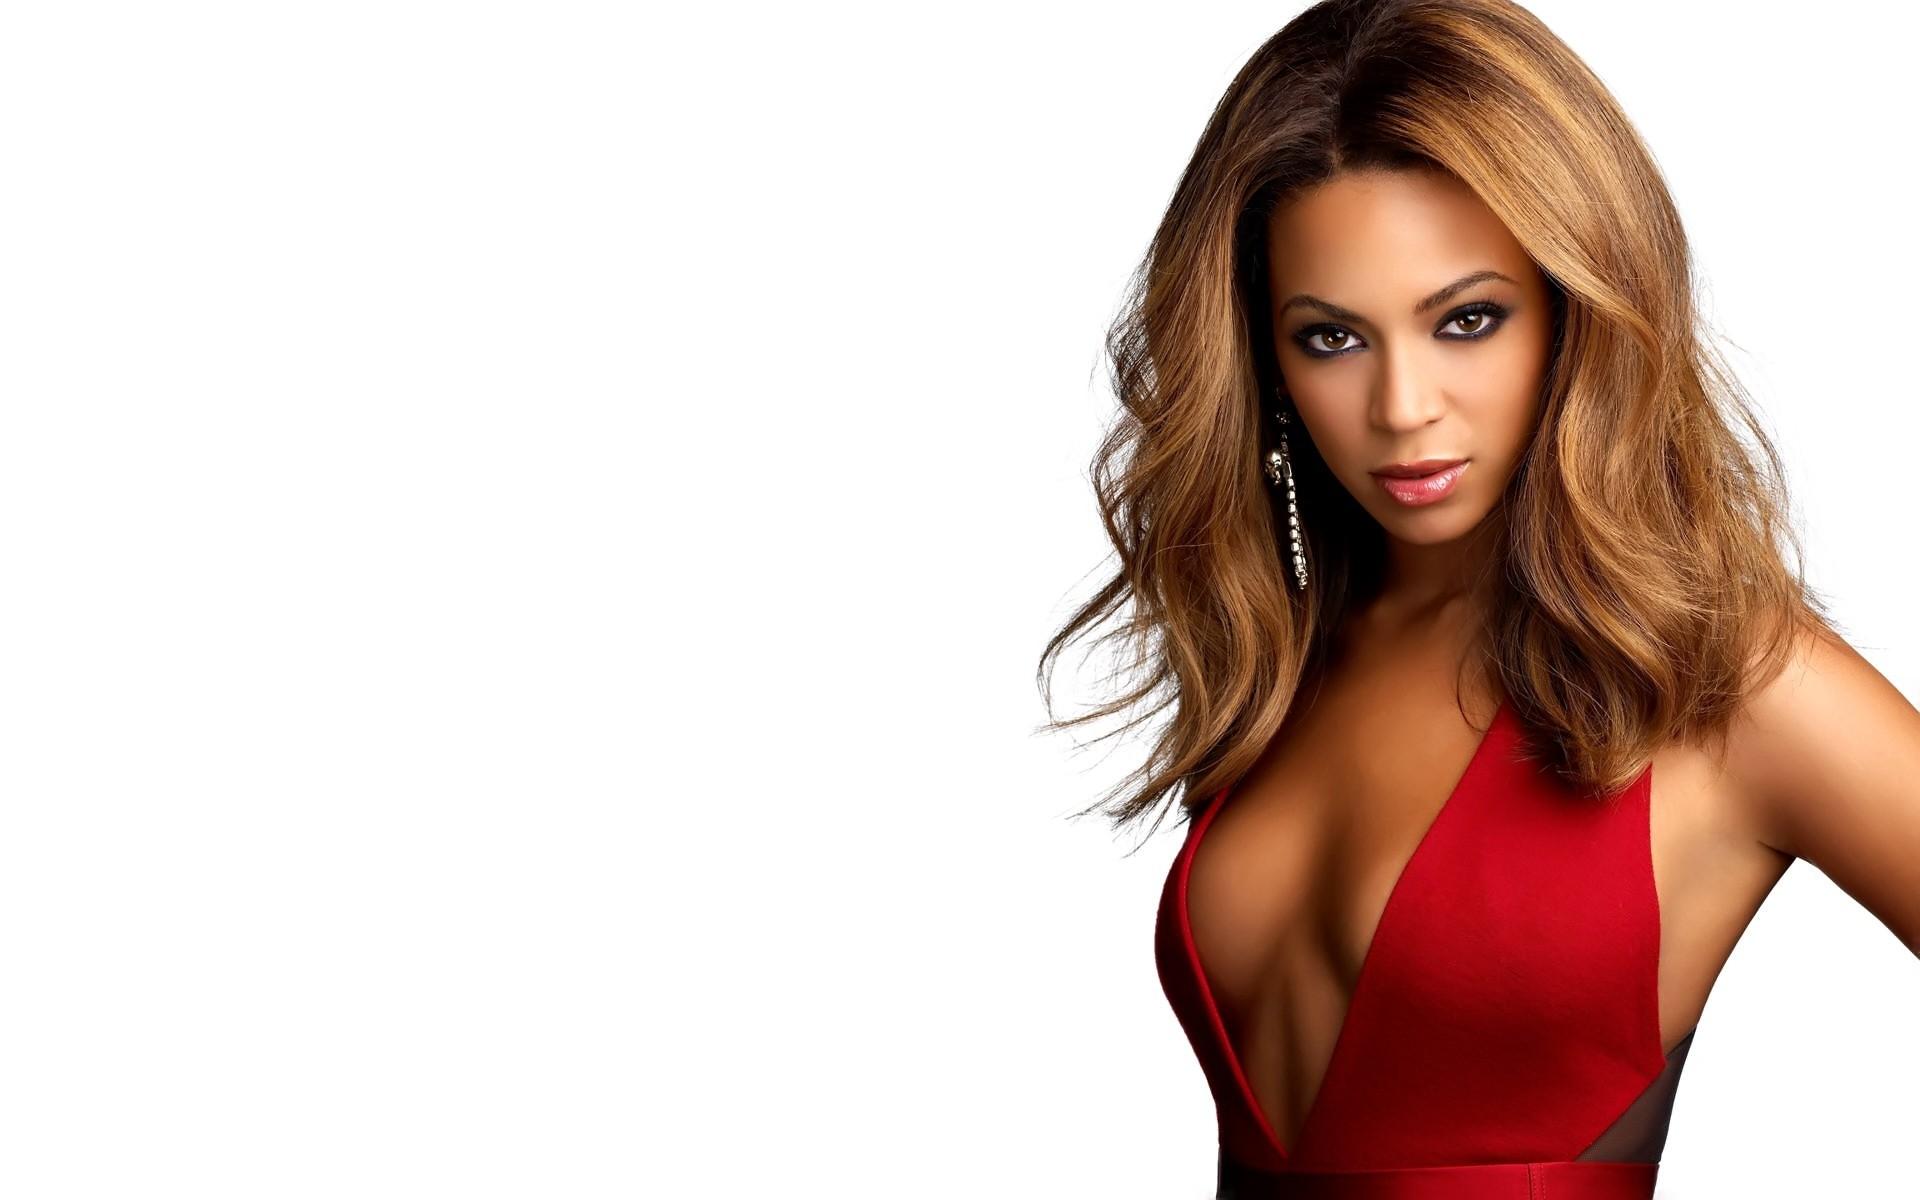 Beyonce beautiful Wallpaper Beyonce Female celebrities Wallpapers